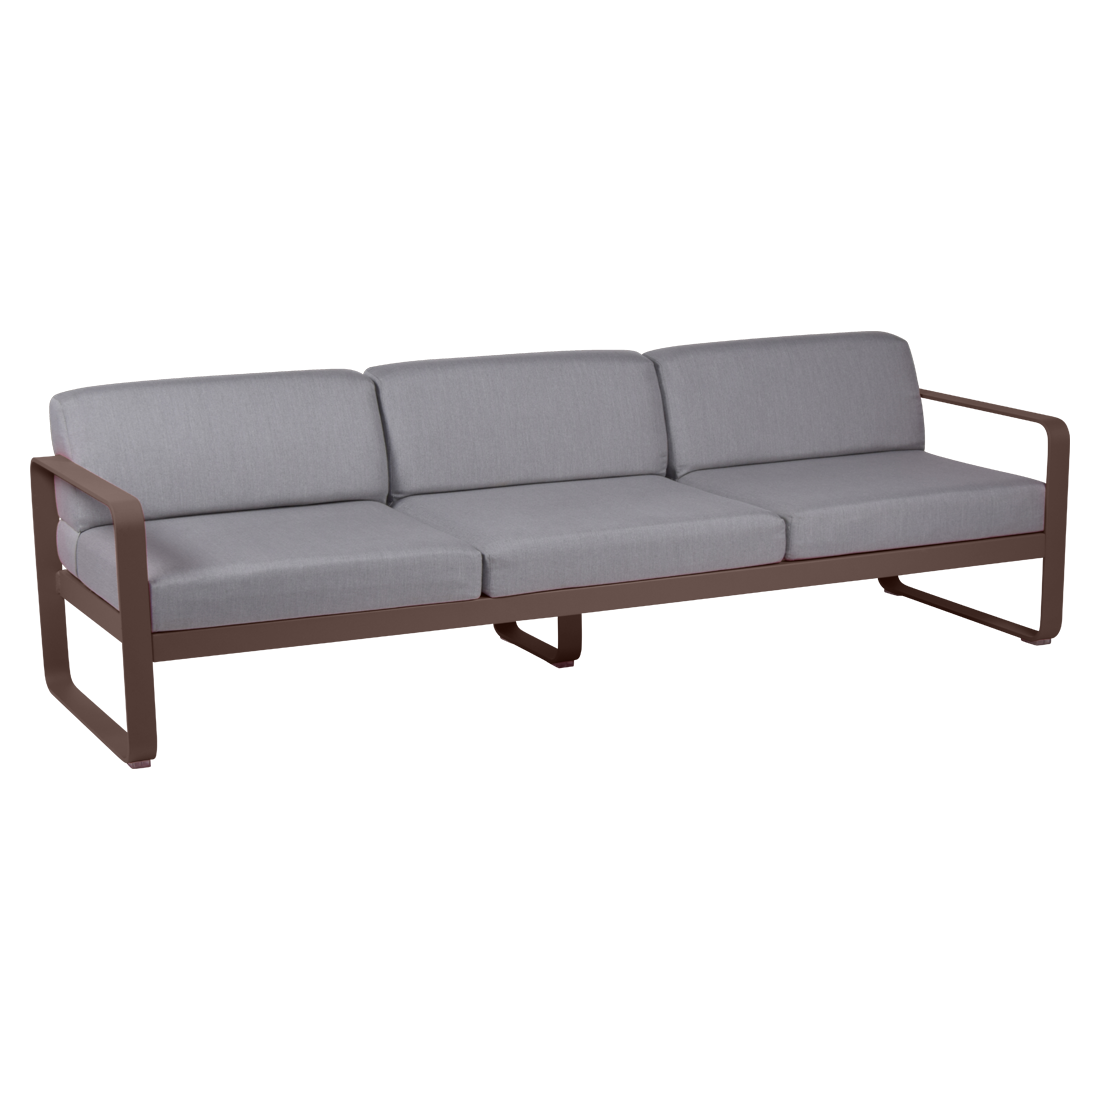 canape de jardin, canape d exterieur, canape fermob, canape metal, canape marron